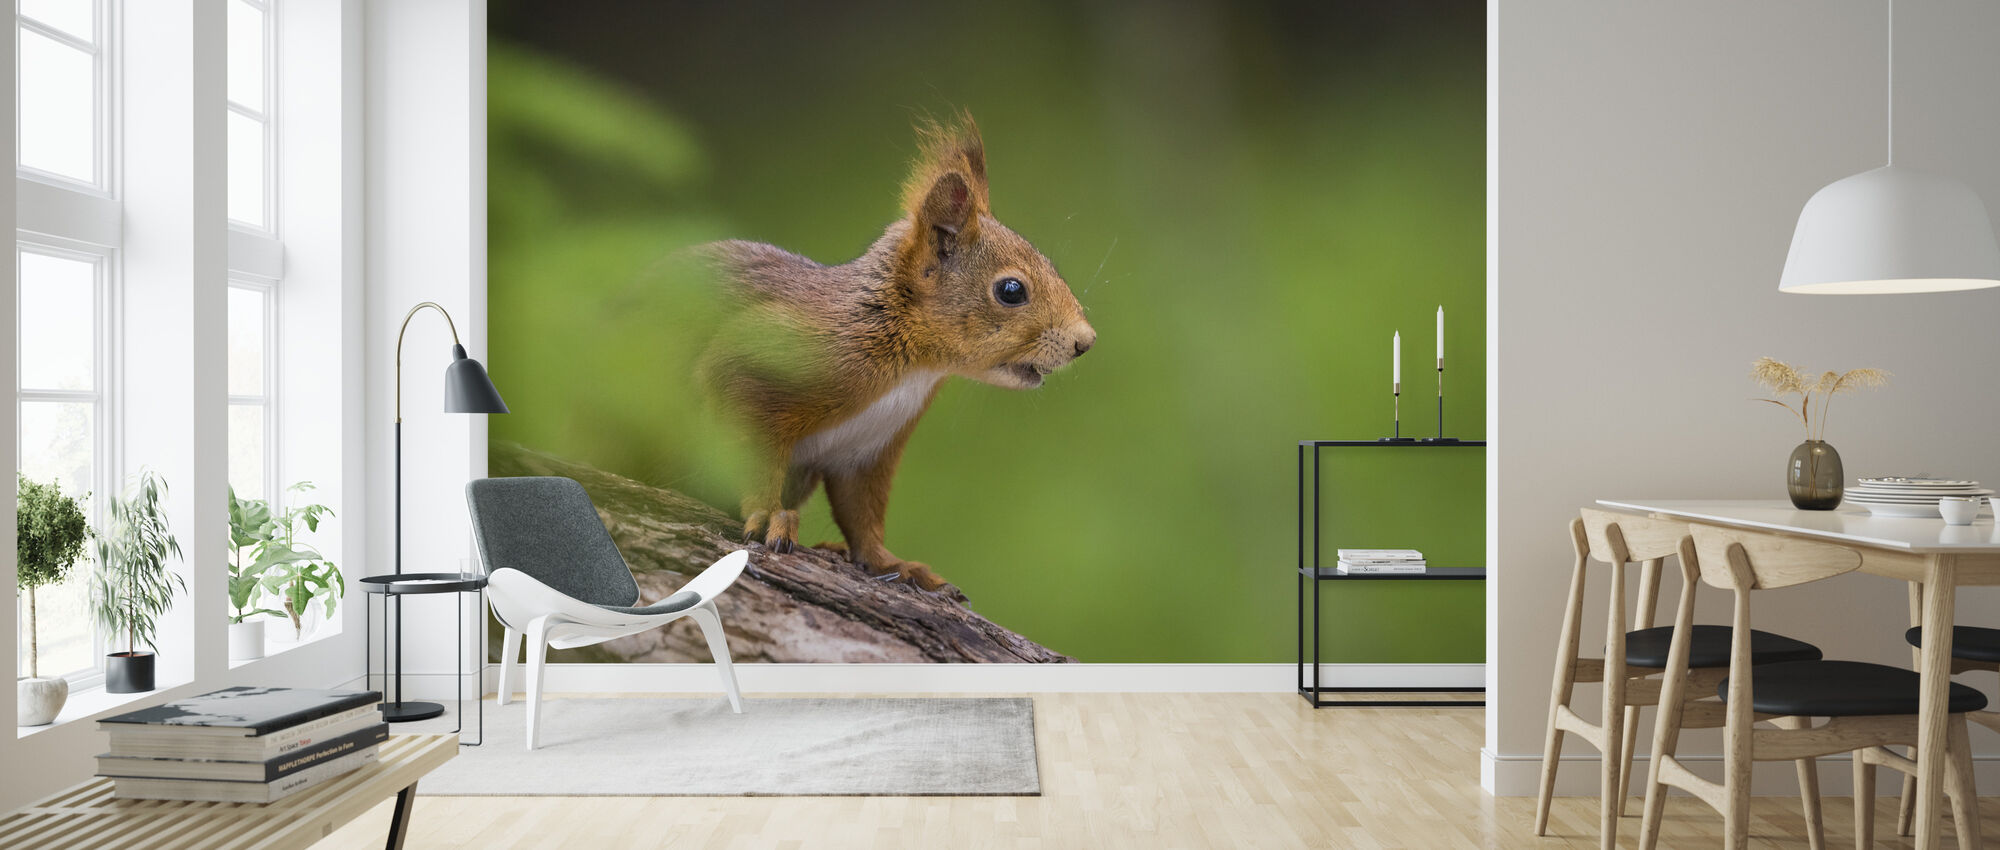 Orava - Tapetti - Olohuone